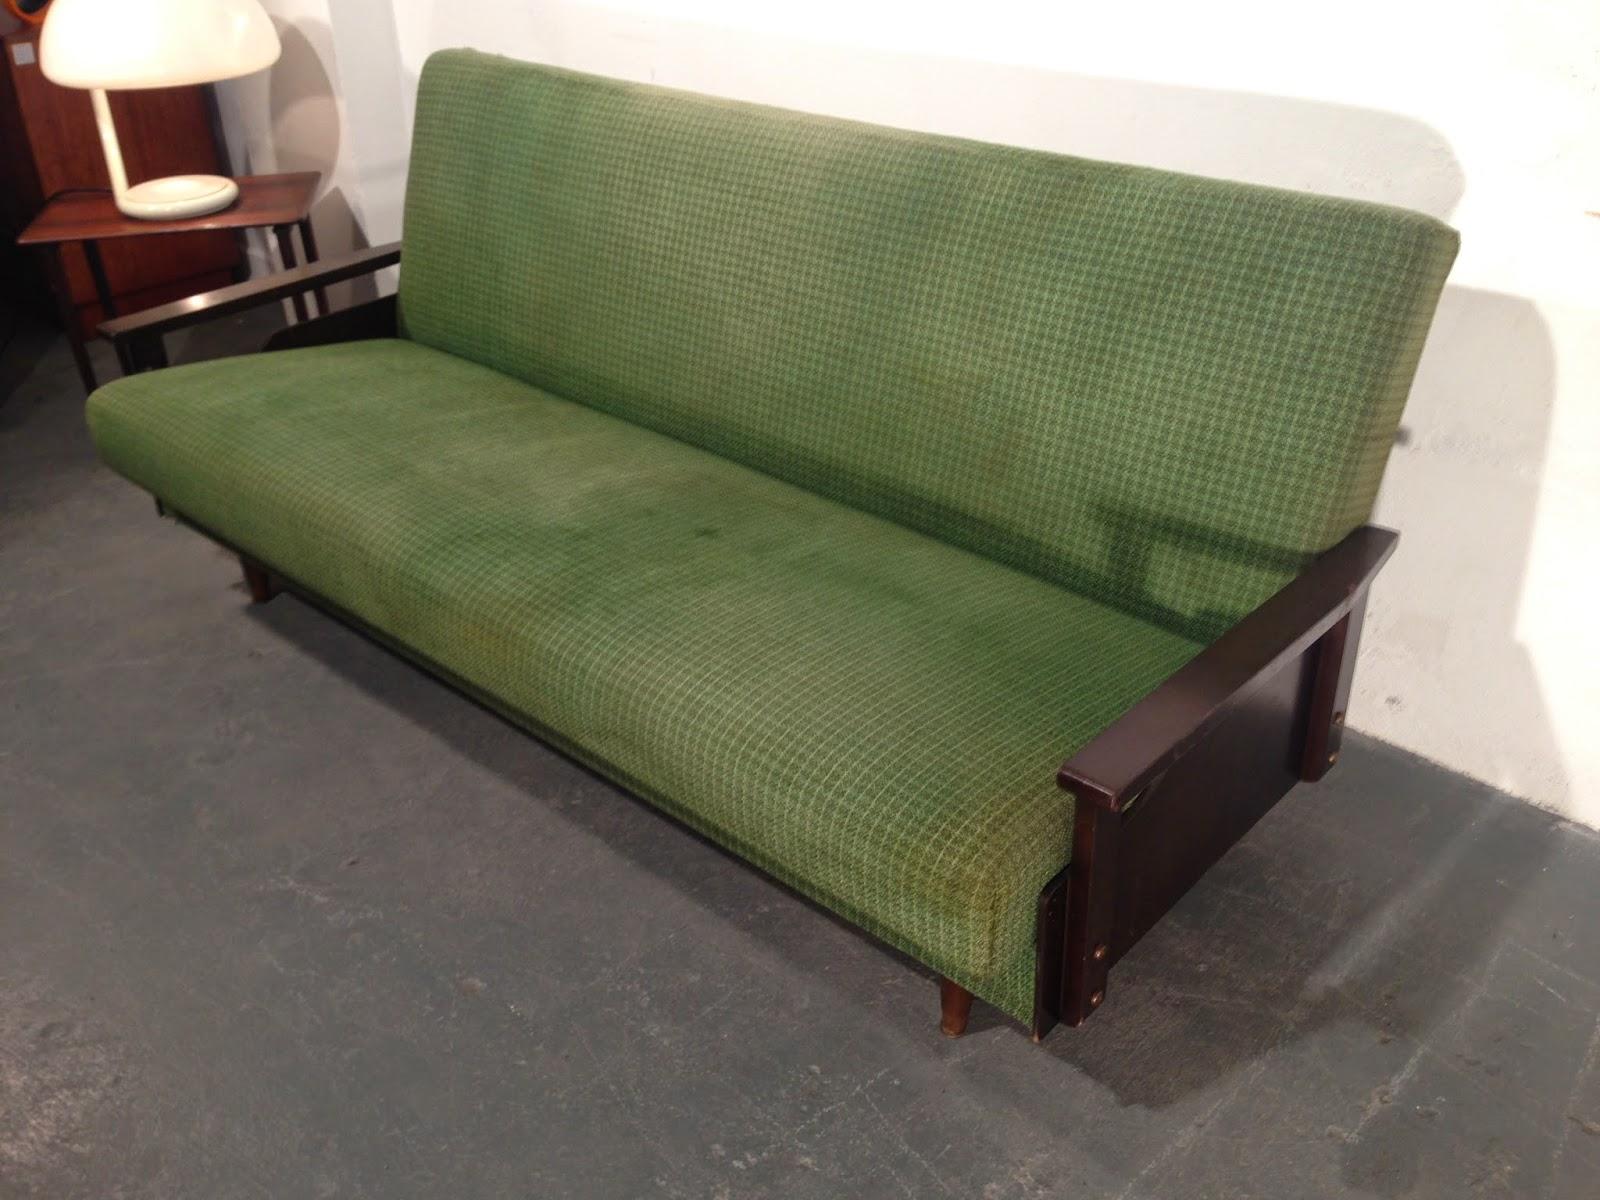 Scandinavian Design Sofa Singapore Dunham Review Designs Sleeper